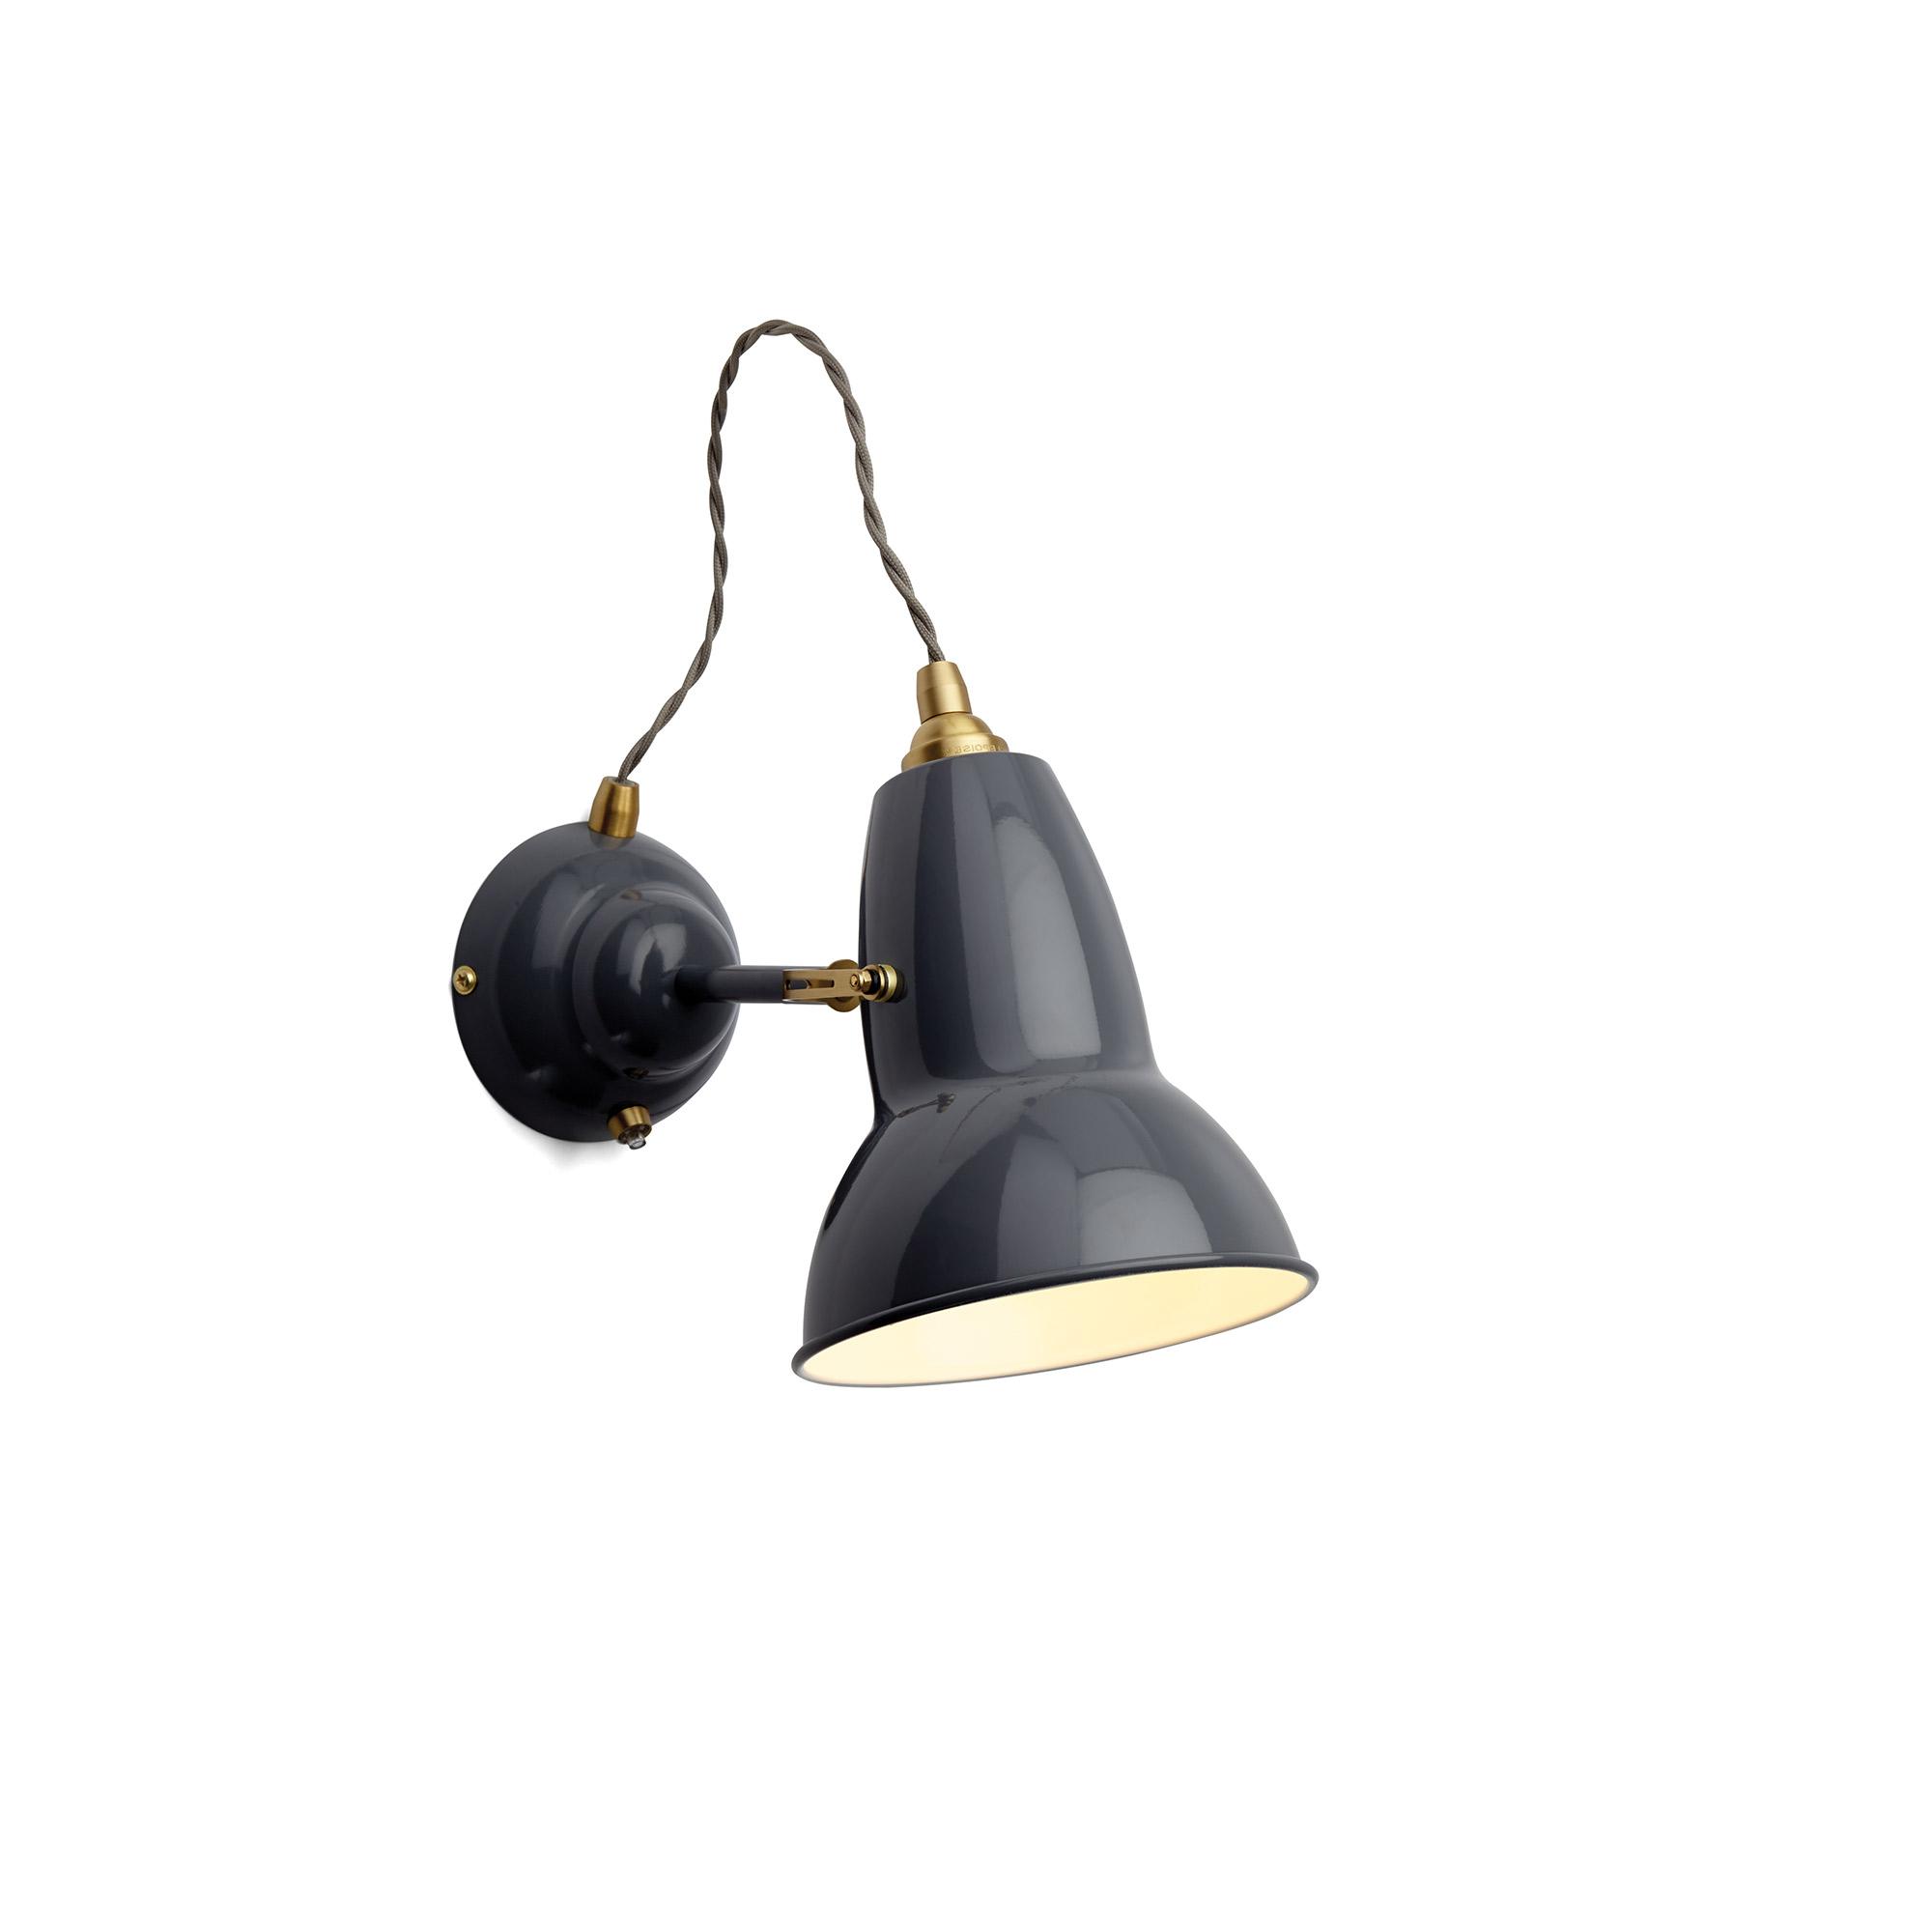 Original 1227 Brass Vägglampa, Elephant Grey